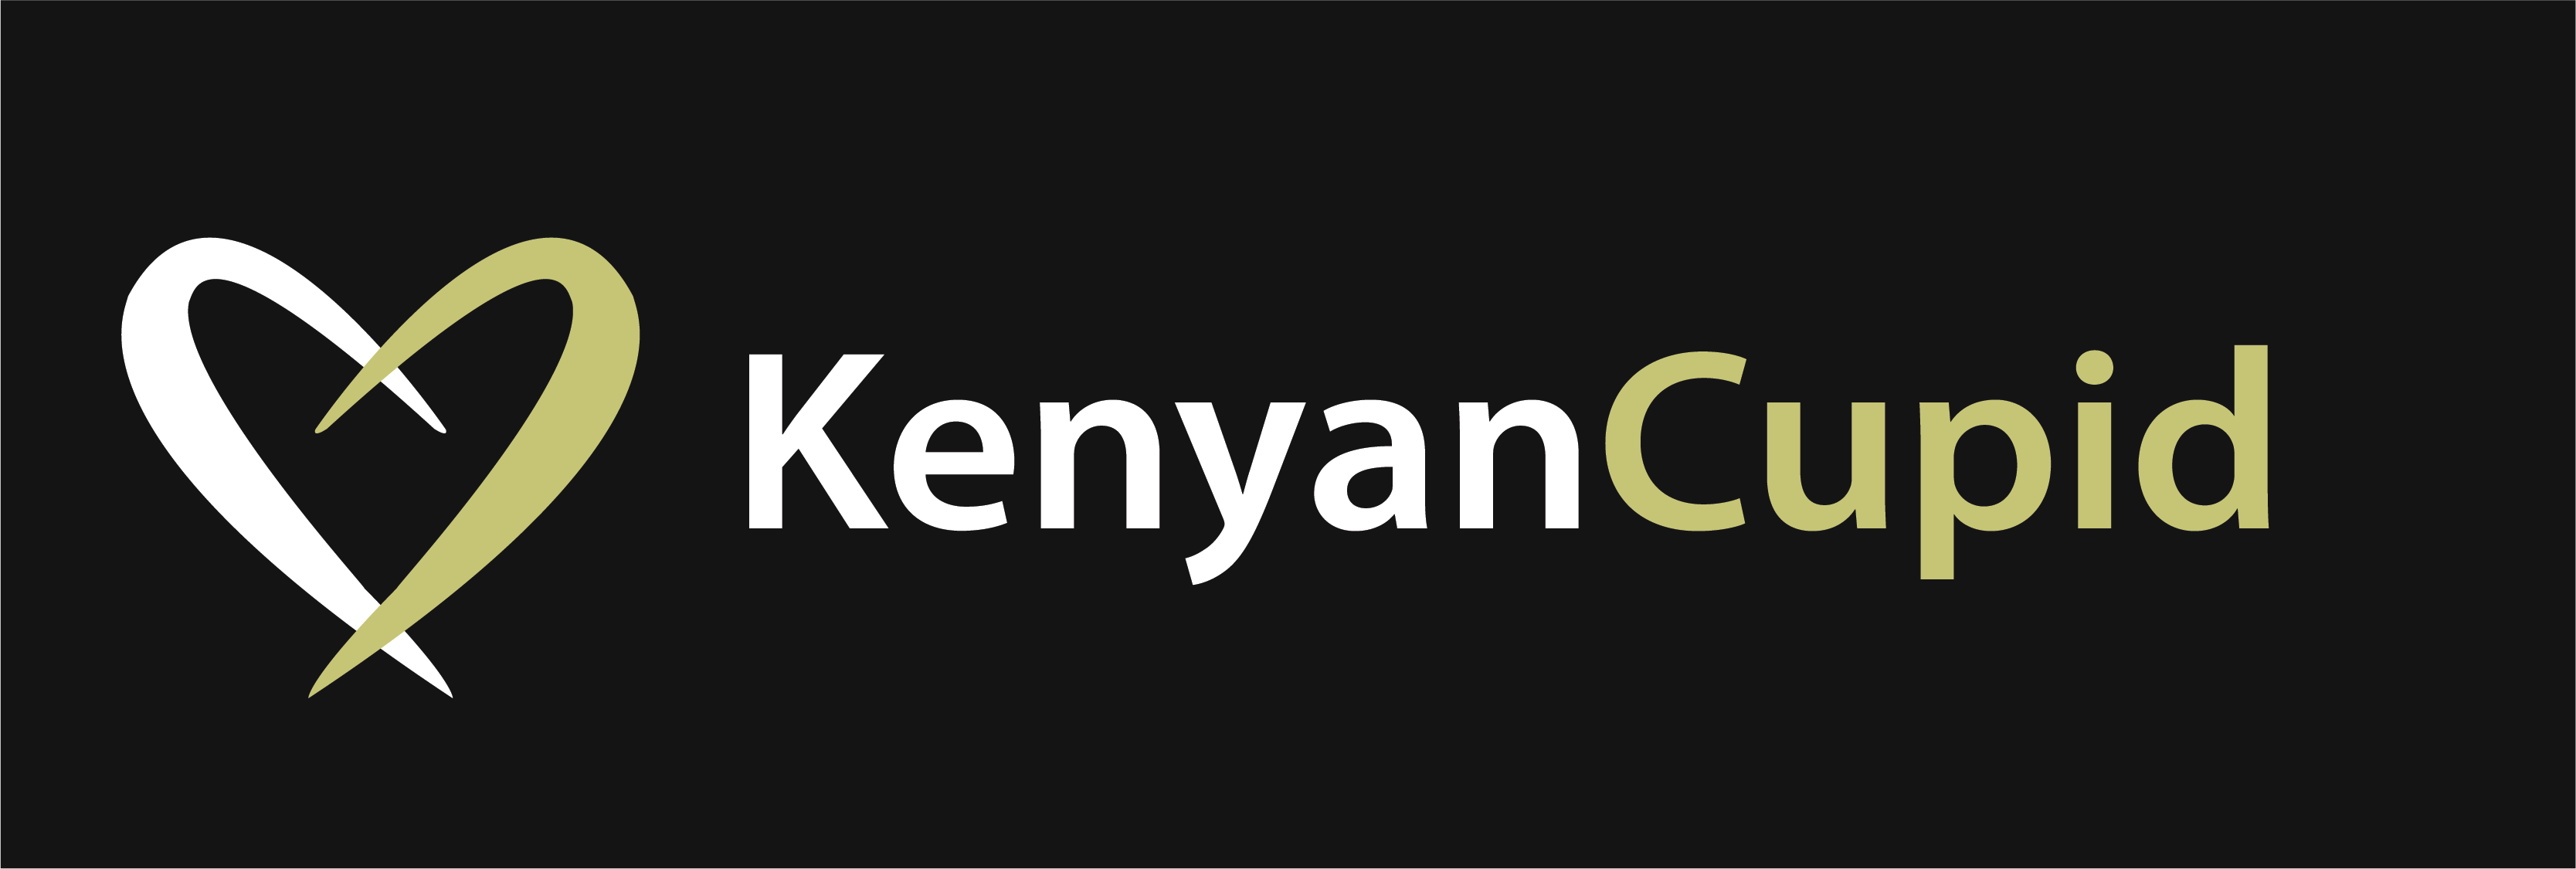 KenyanCupid Logo